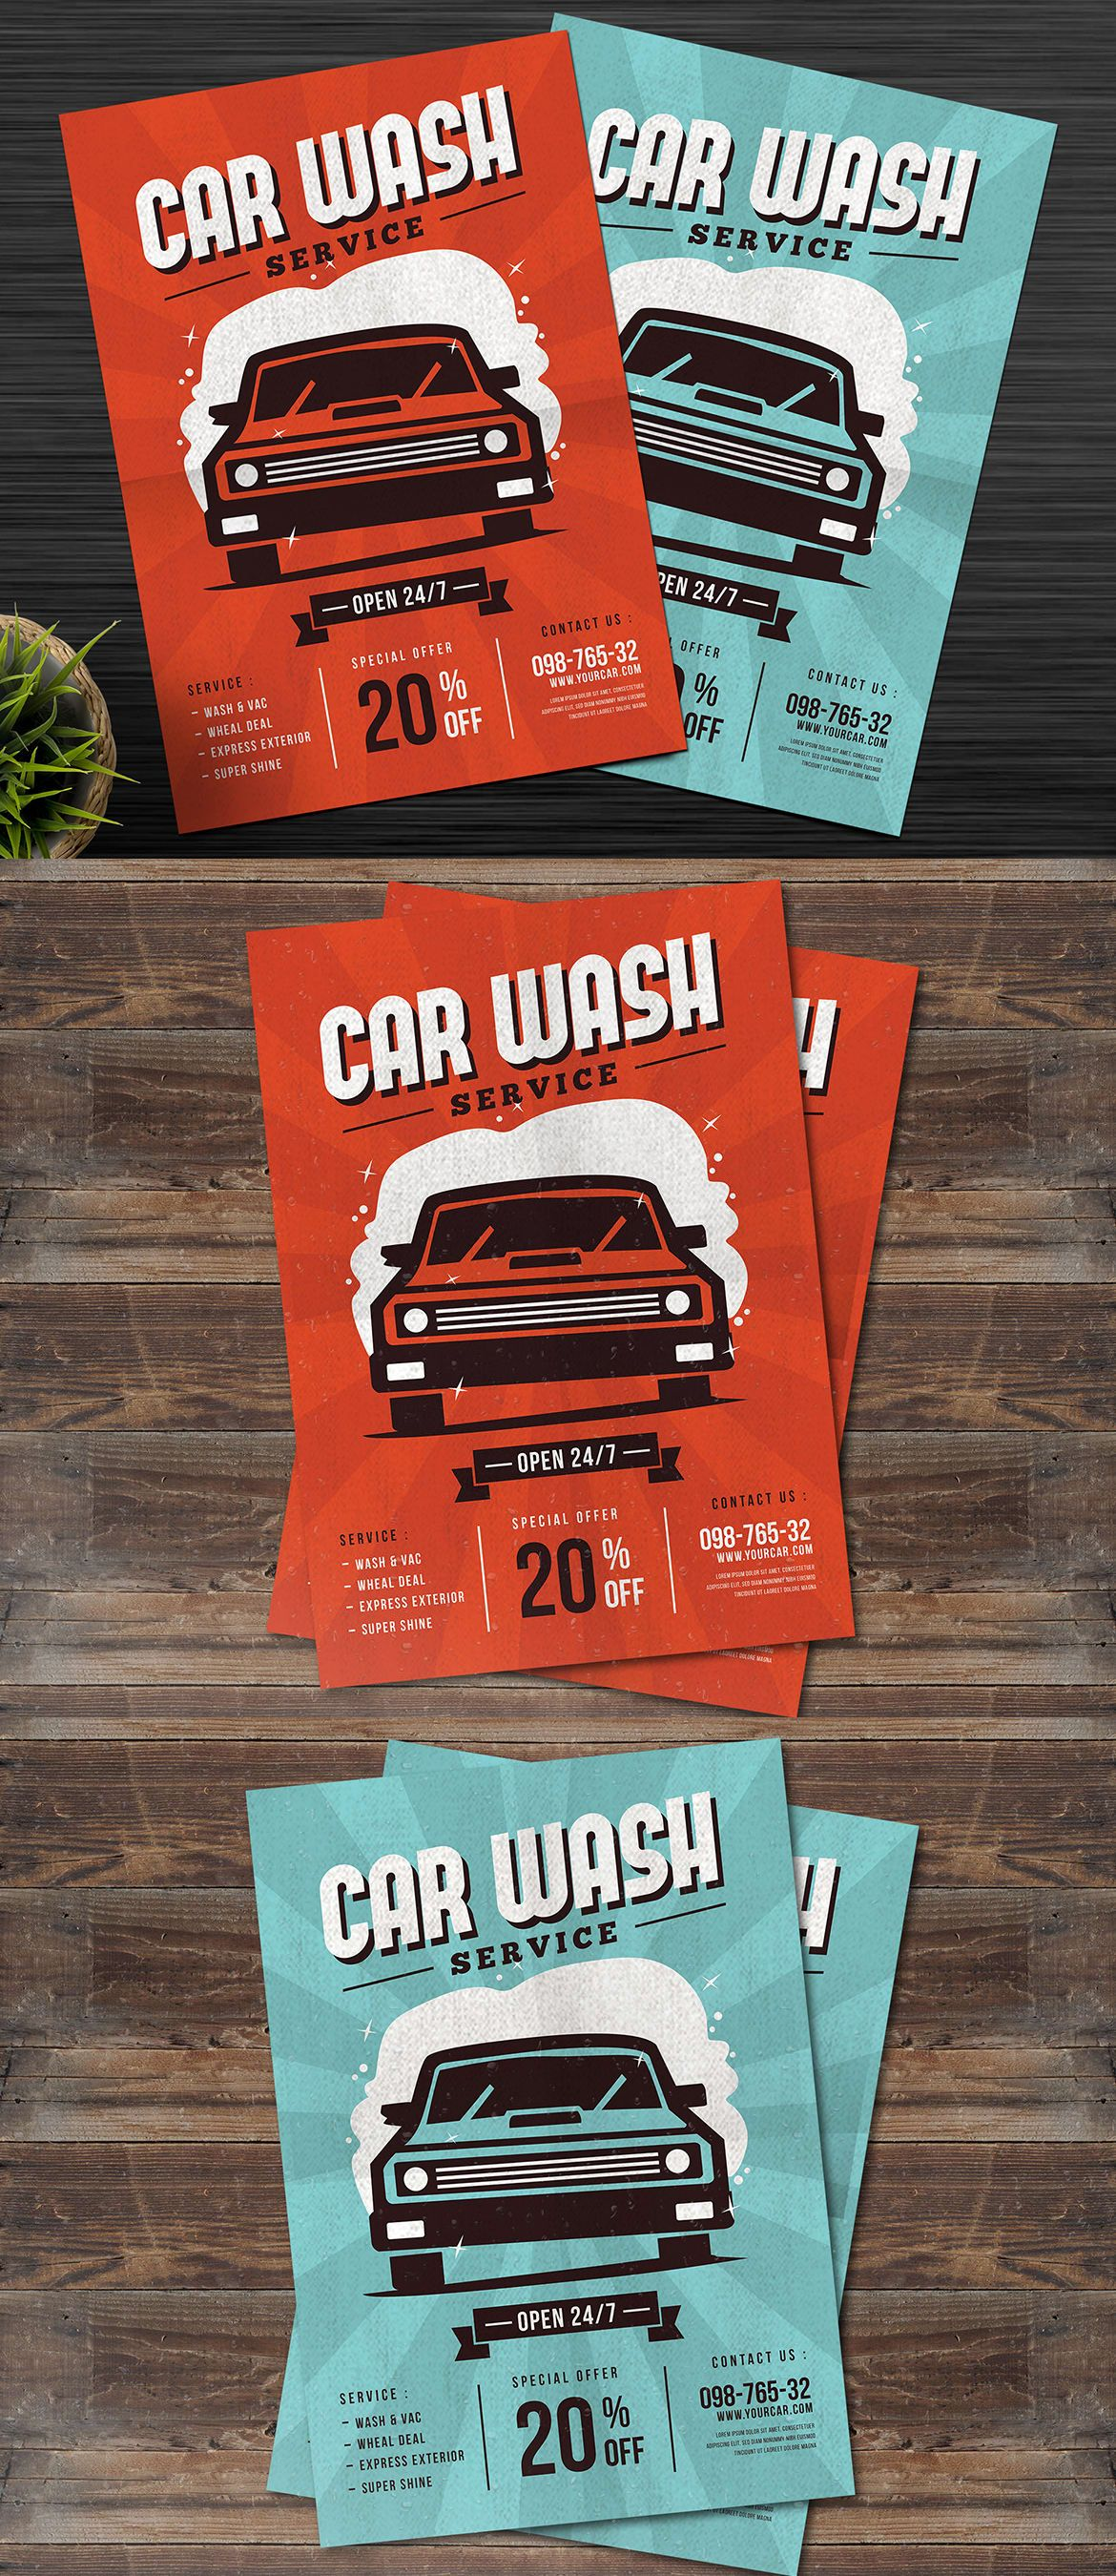 Car Wash Service Flyer Template AI, PSD